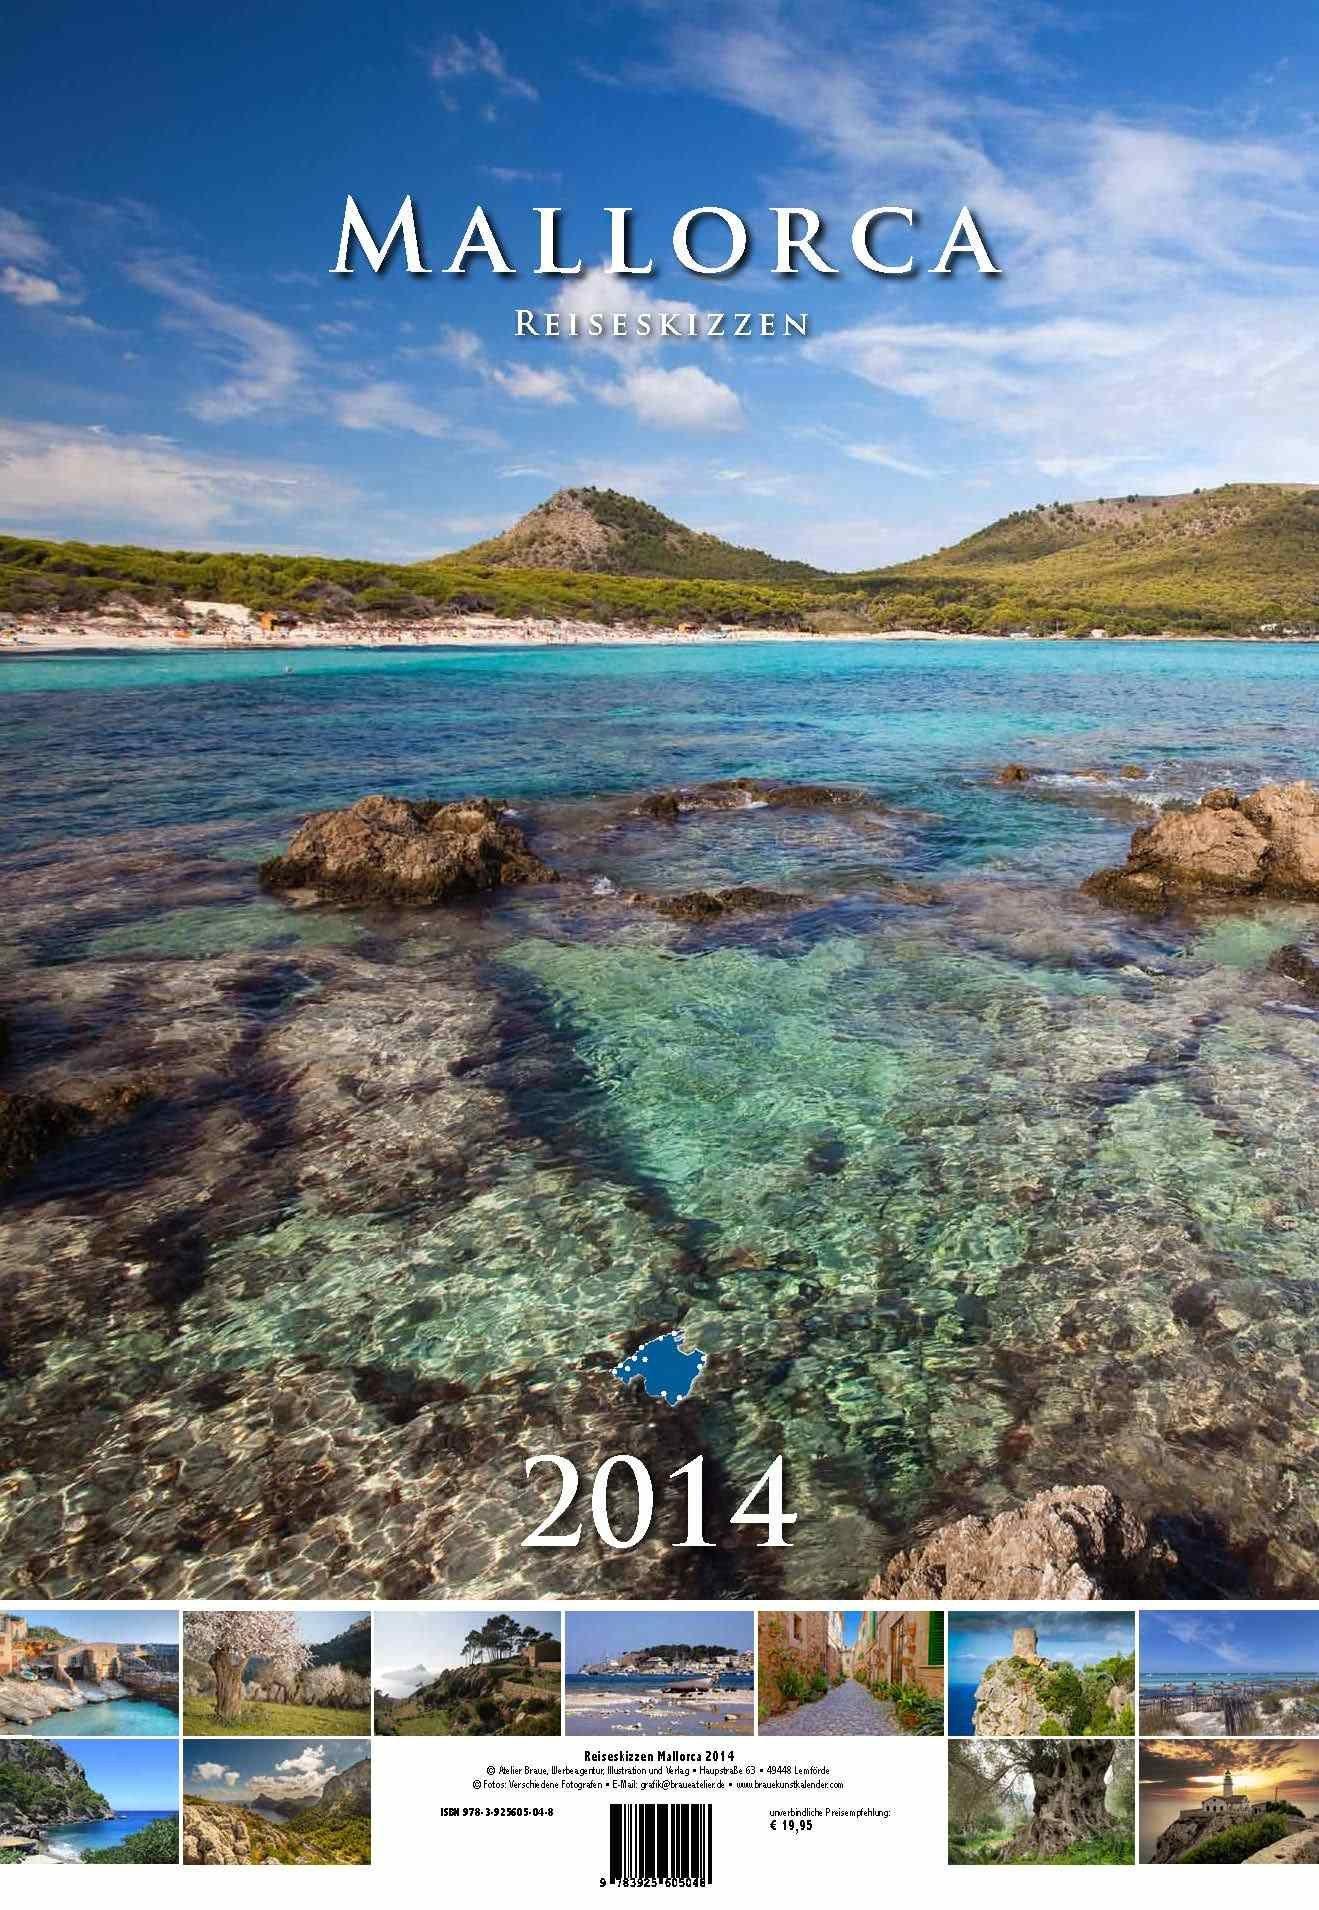 Reiseskizzen Mallorca 2014: Fotoreise durch Mallorca. Kalender zum Planen /Notizen /Träumen: Fotoreise, Kalender 2014